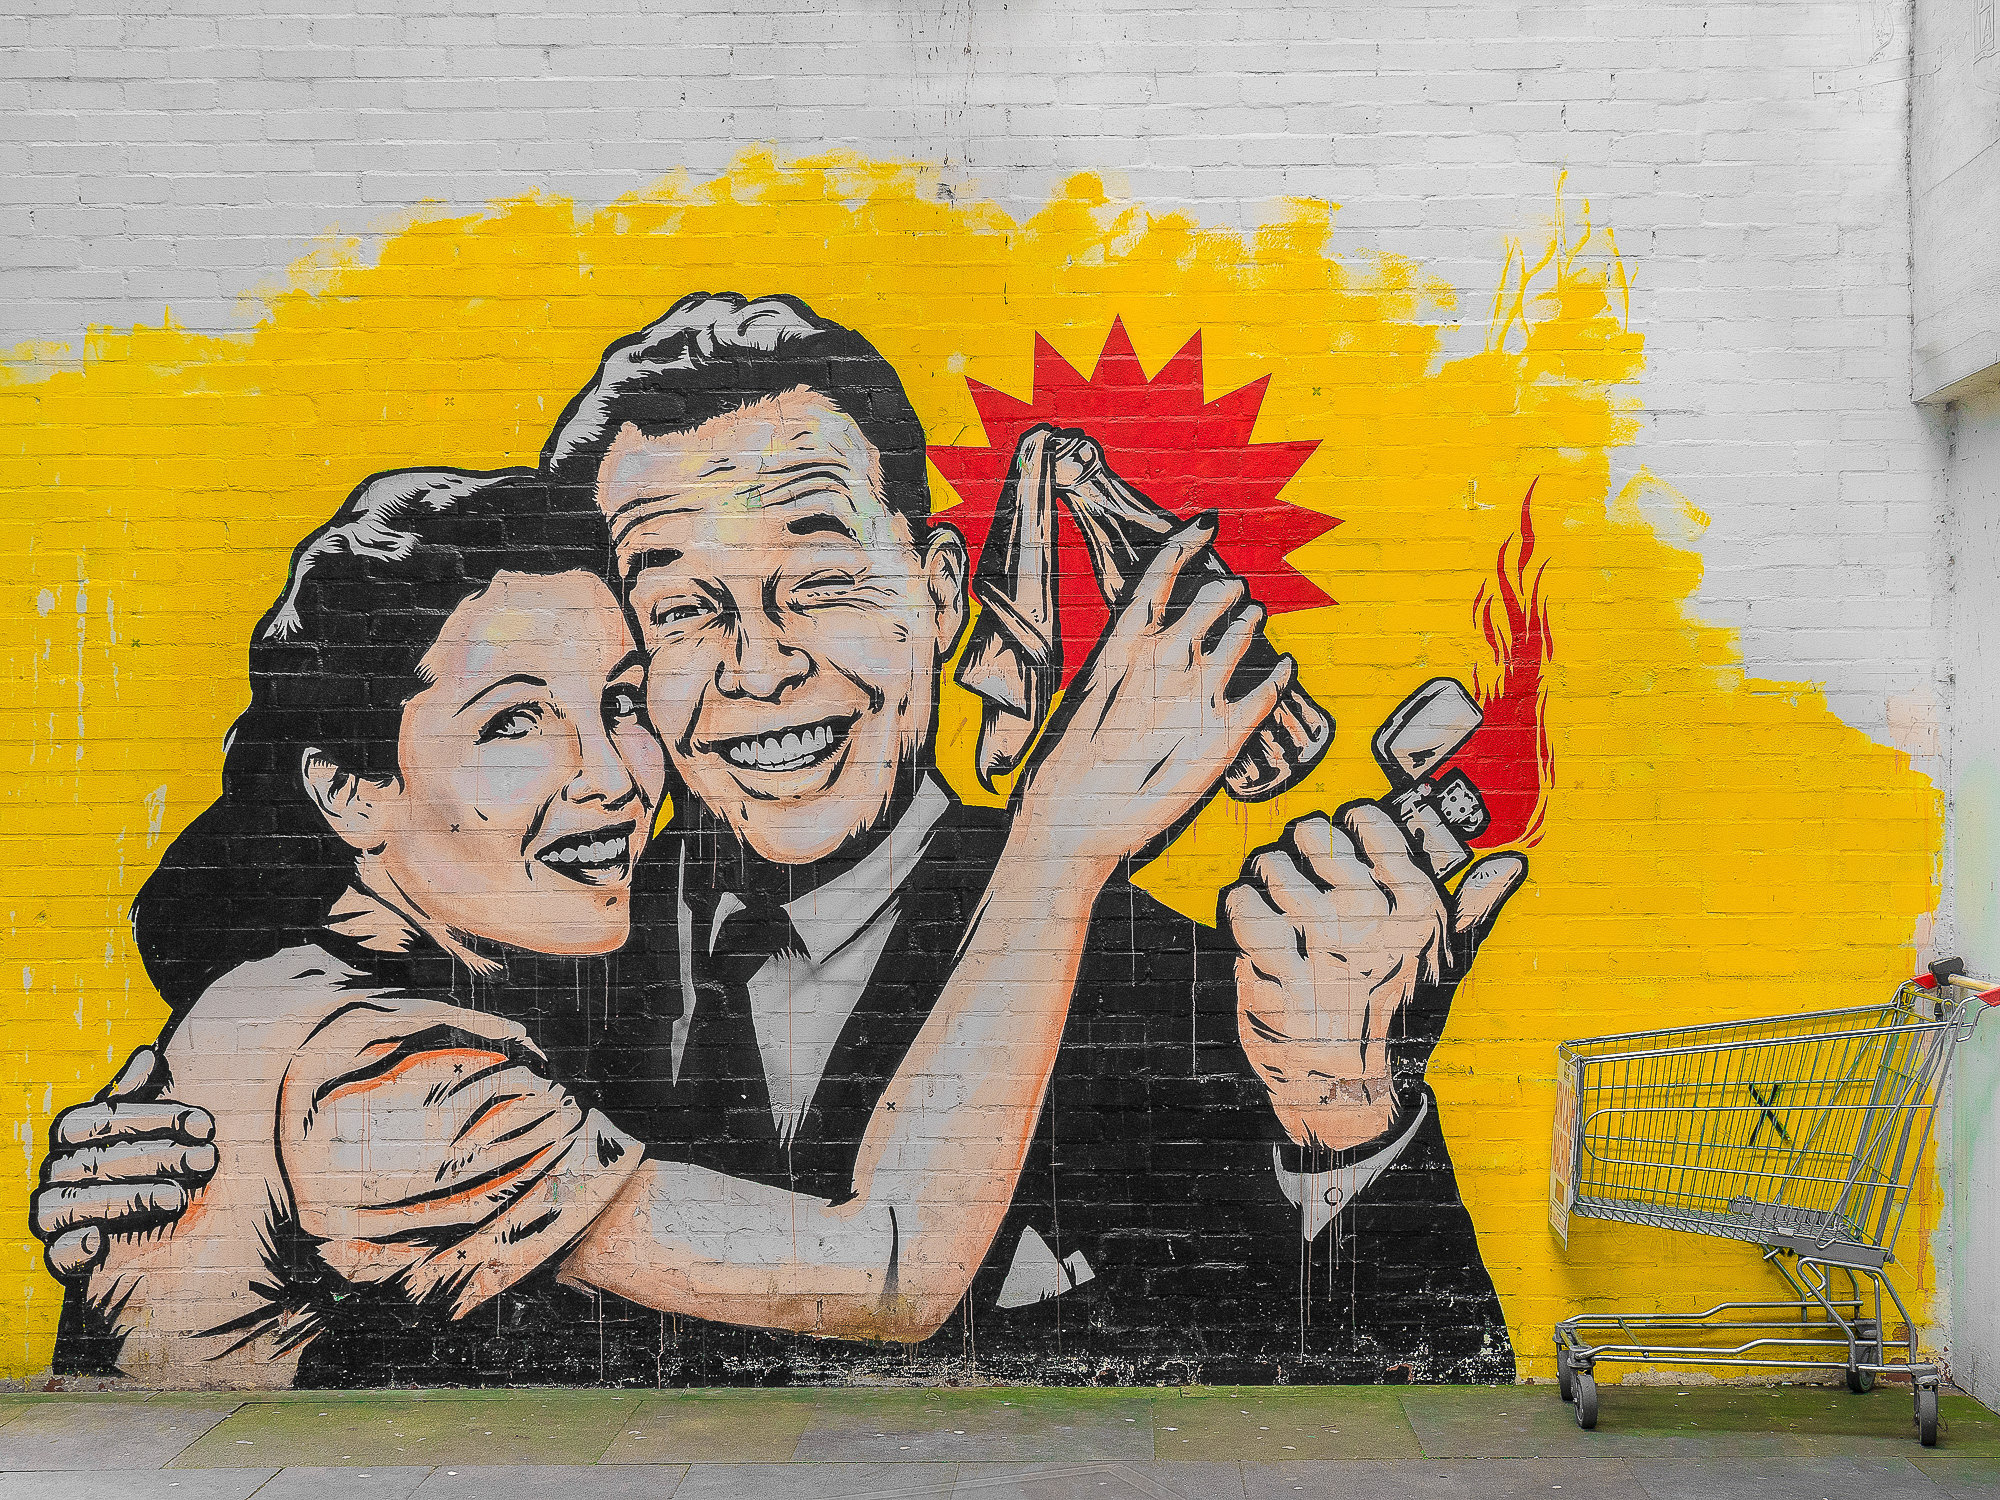 graffiti street art - Birmingham - Digbeth